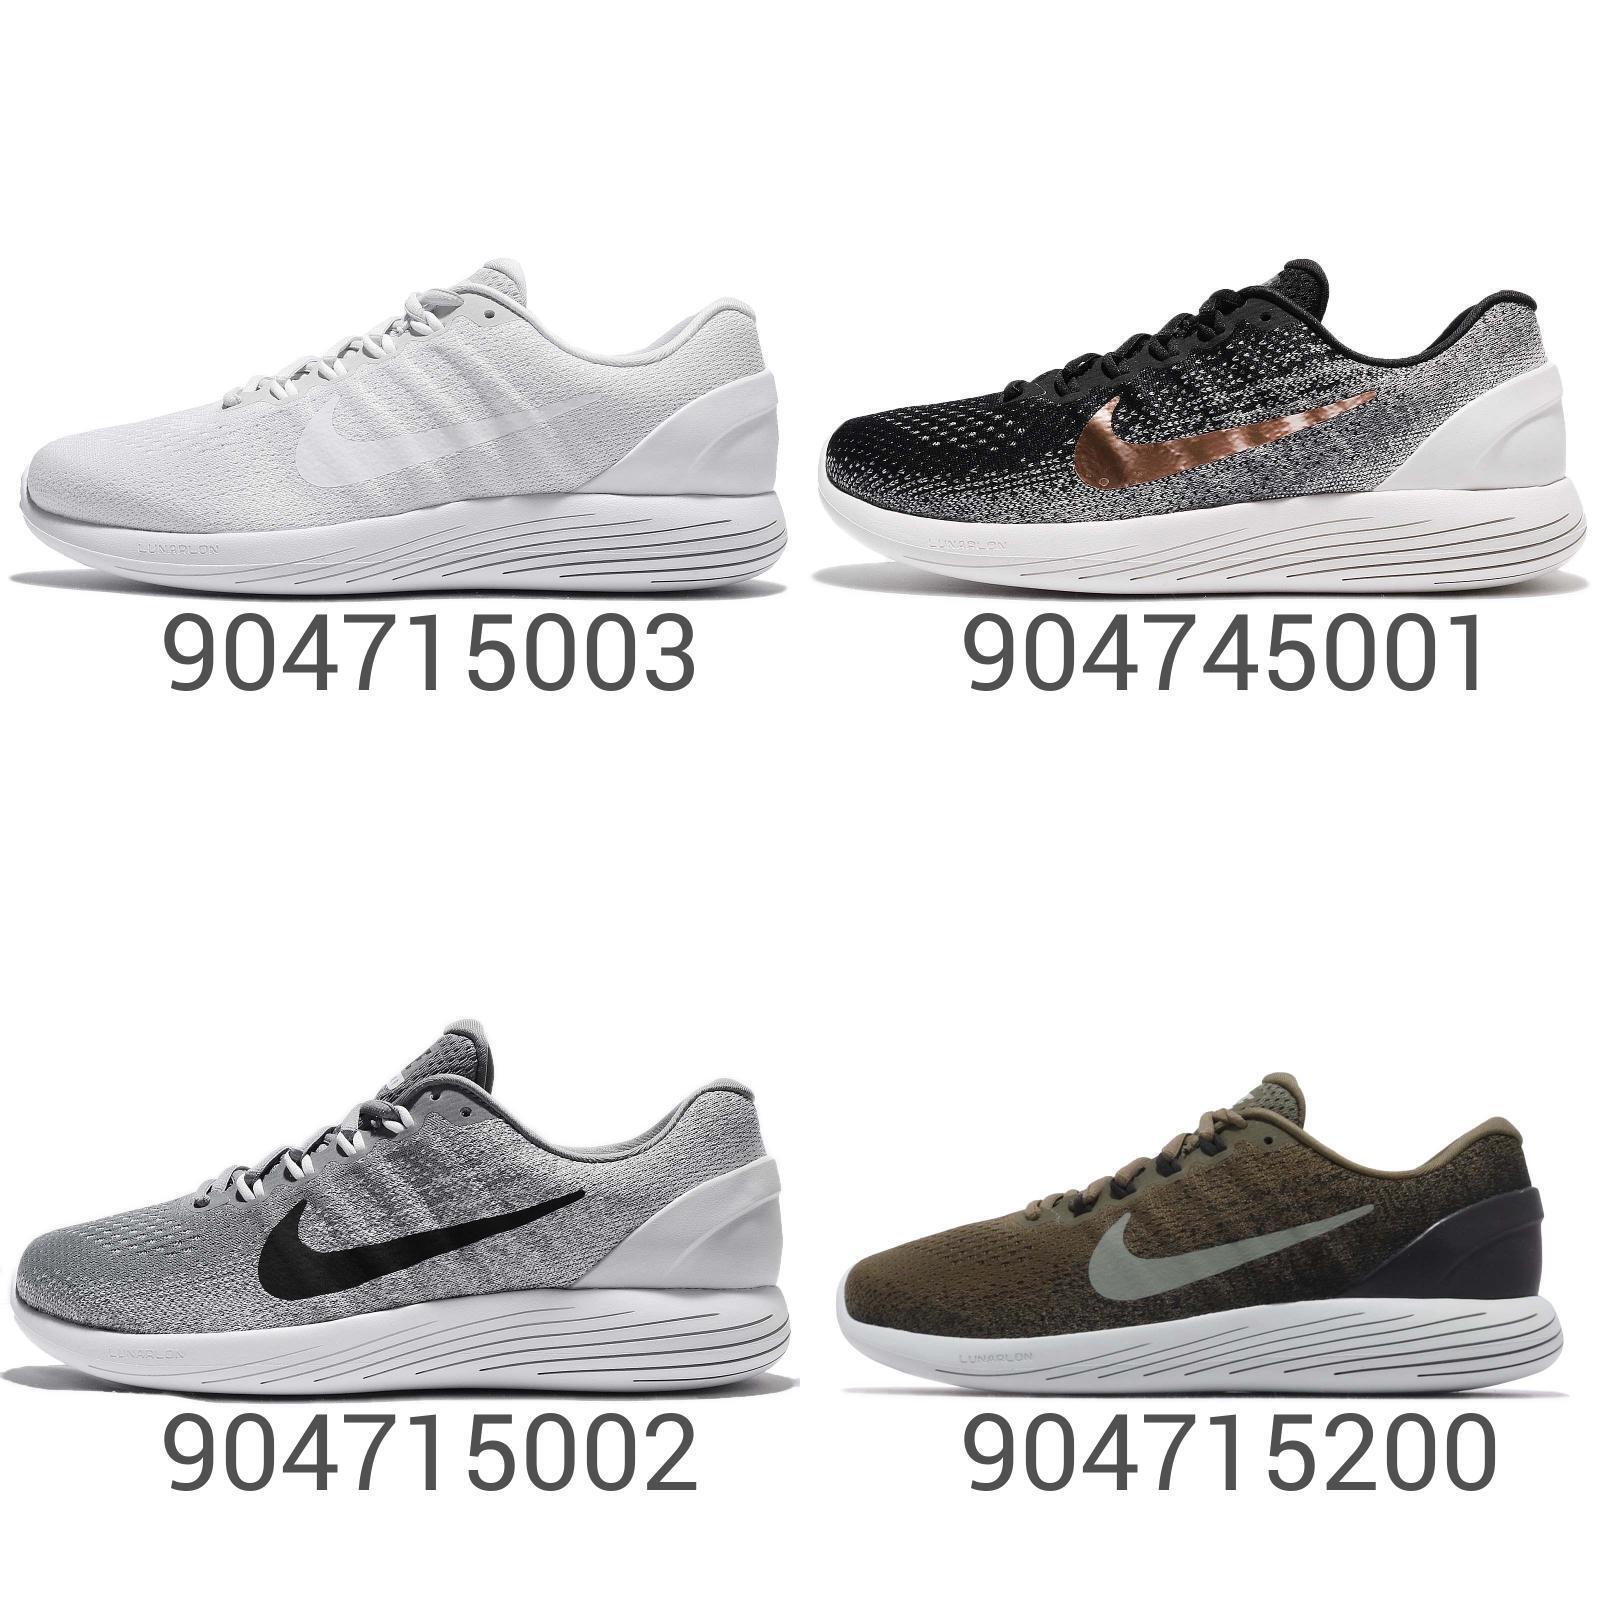 Nike Lunarglide 9 Mens Running shoes Lunarlon Cushion Sneakers Pick 1